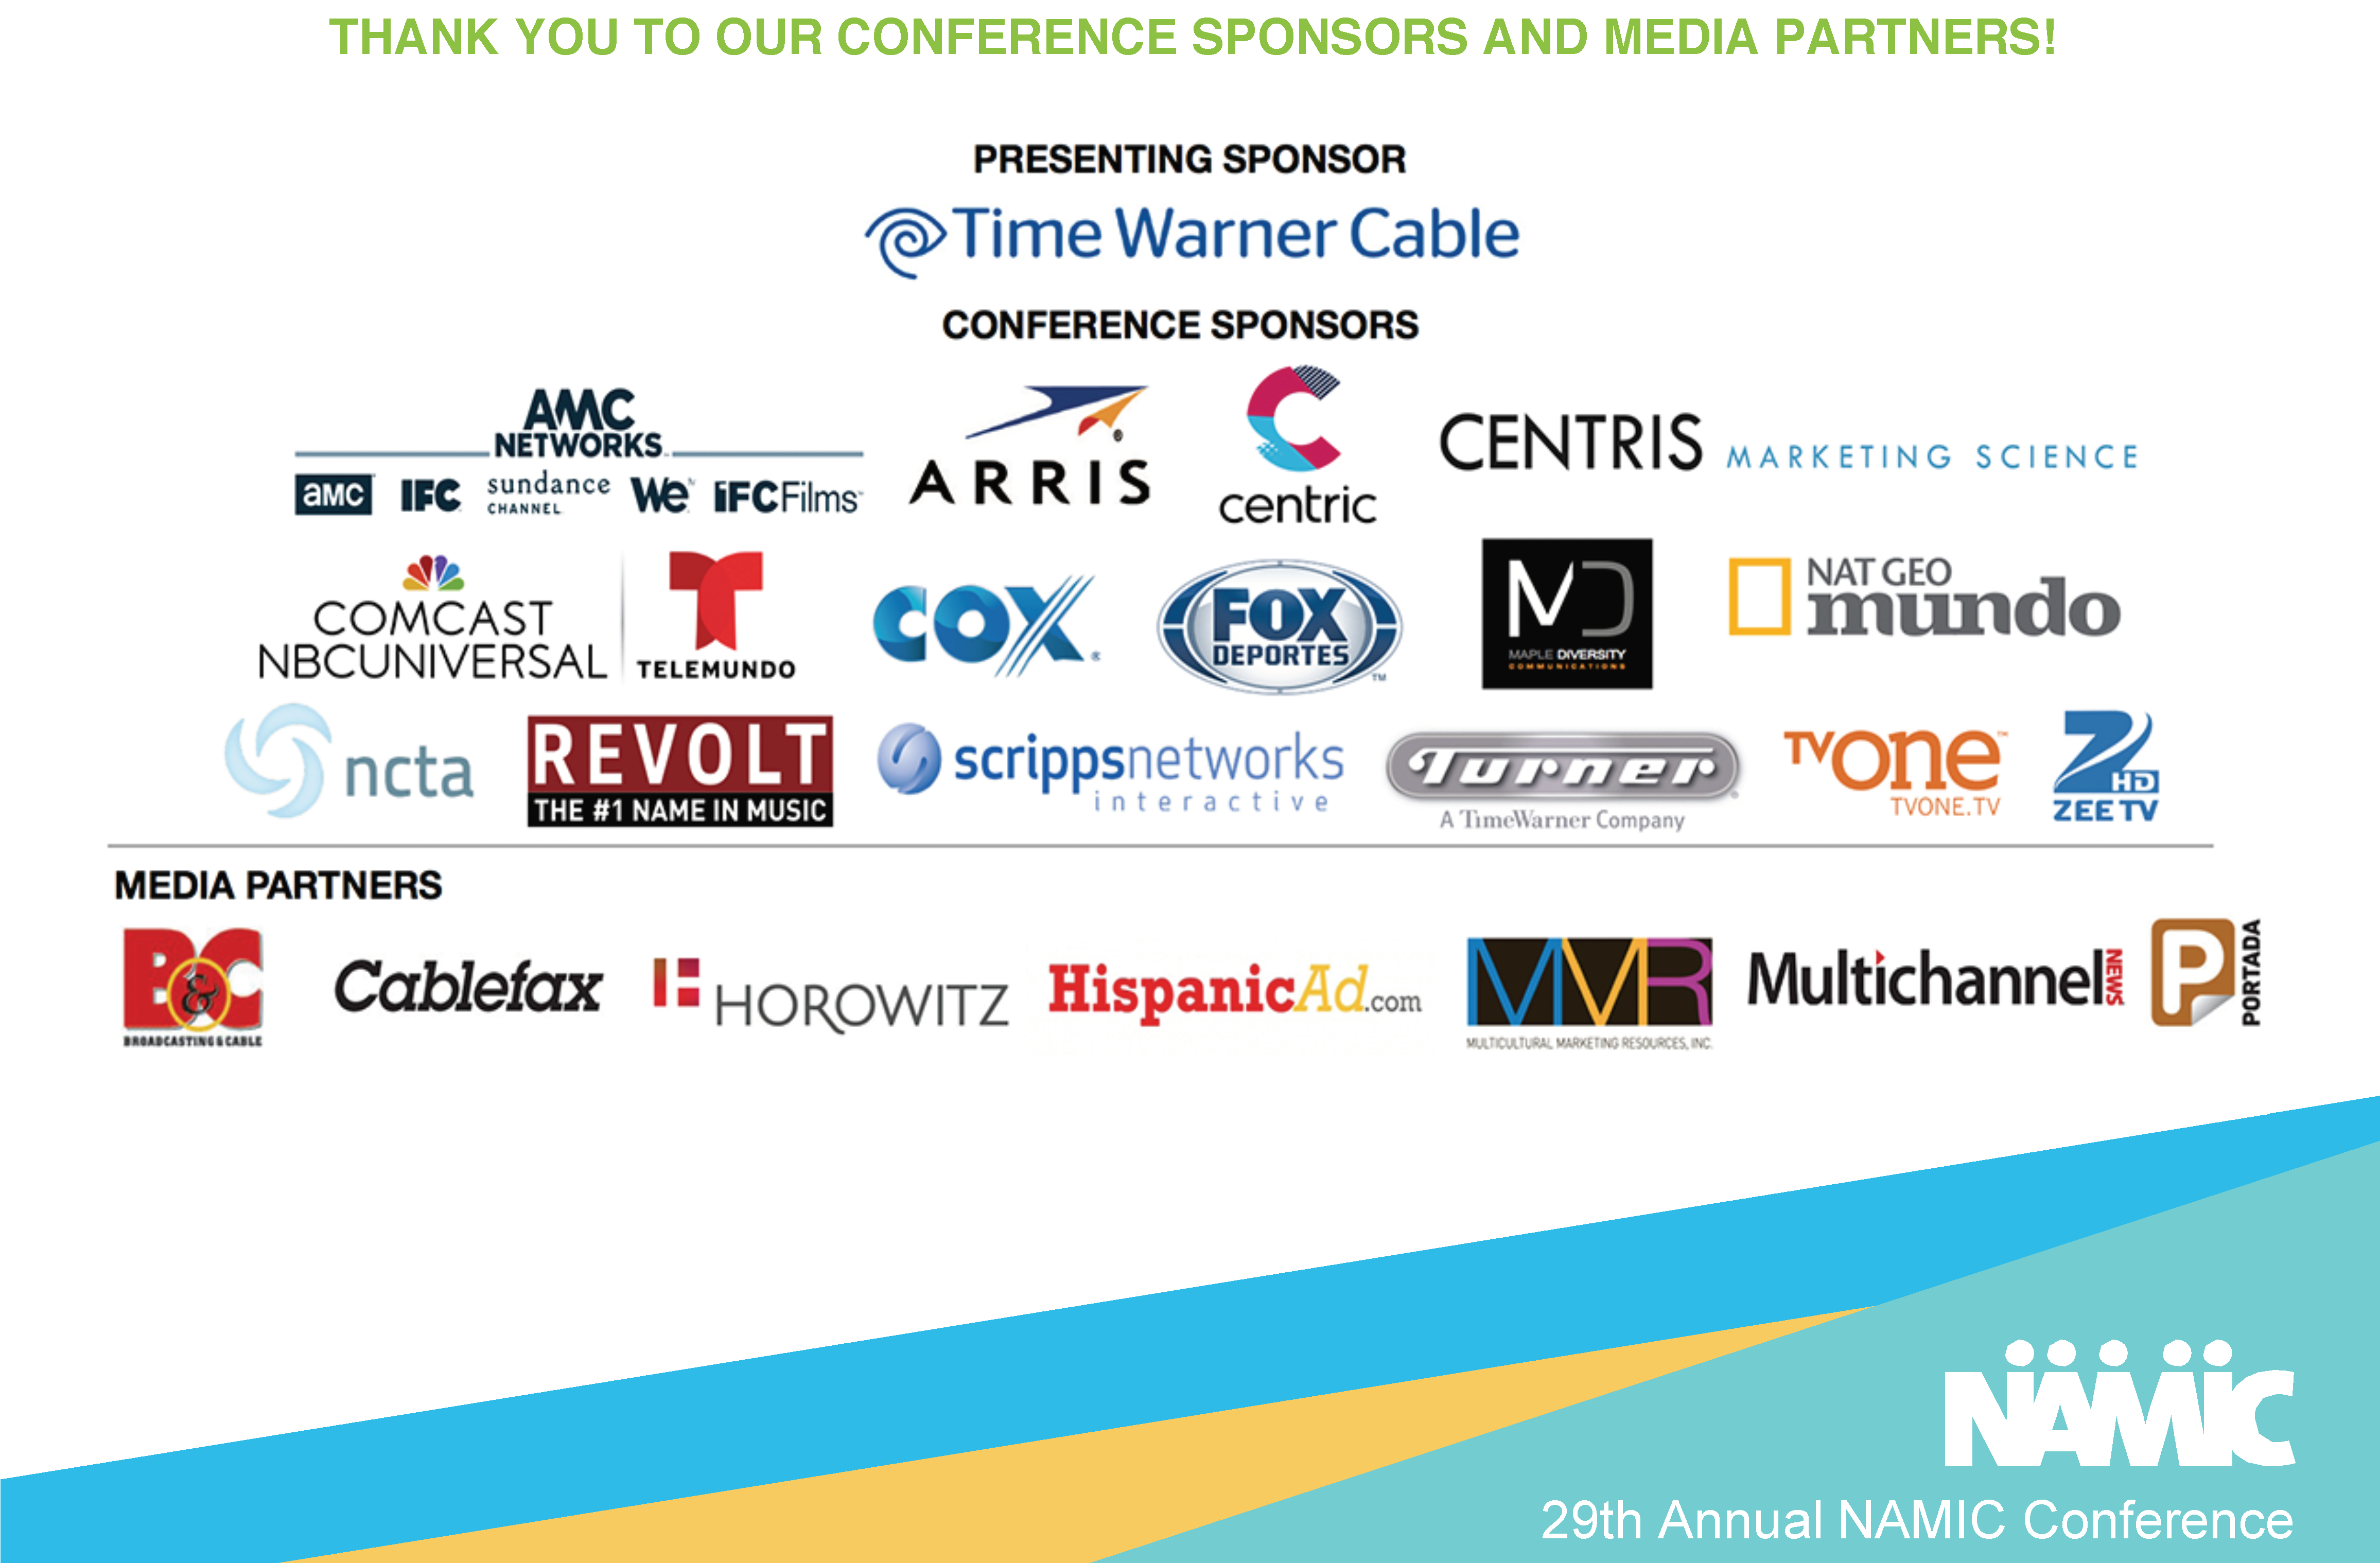 Conference Sponsors-Media Partners